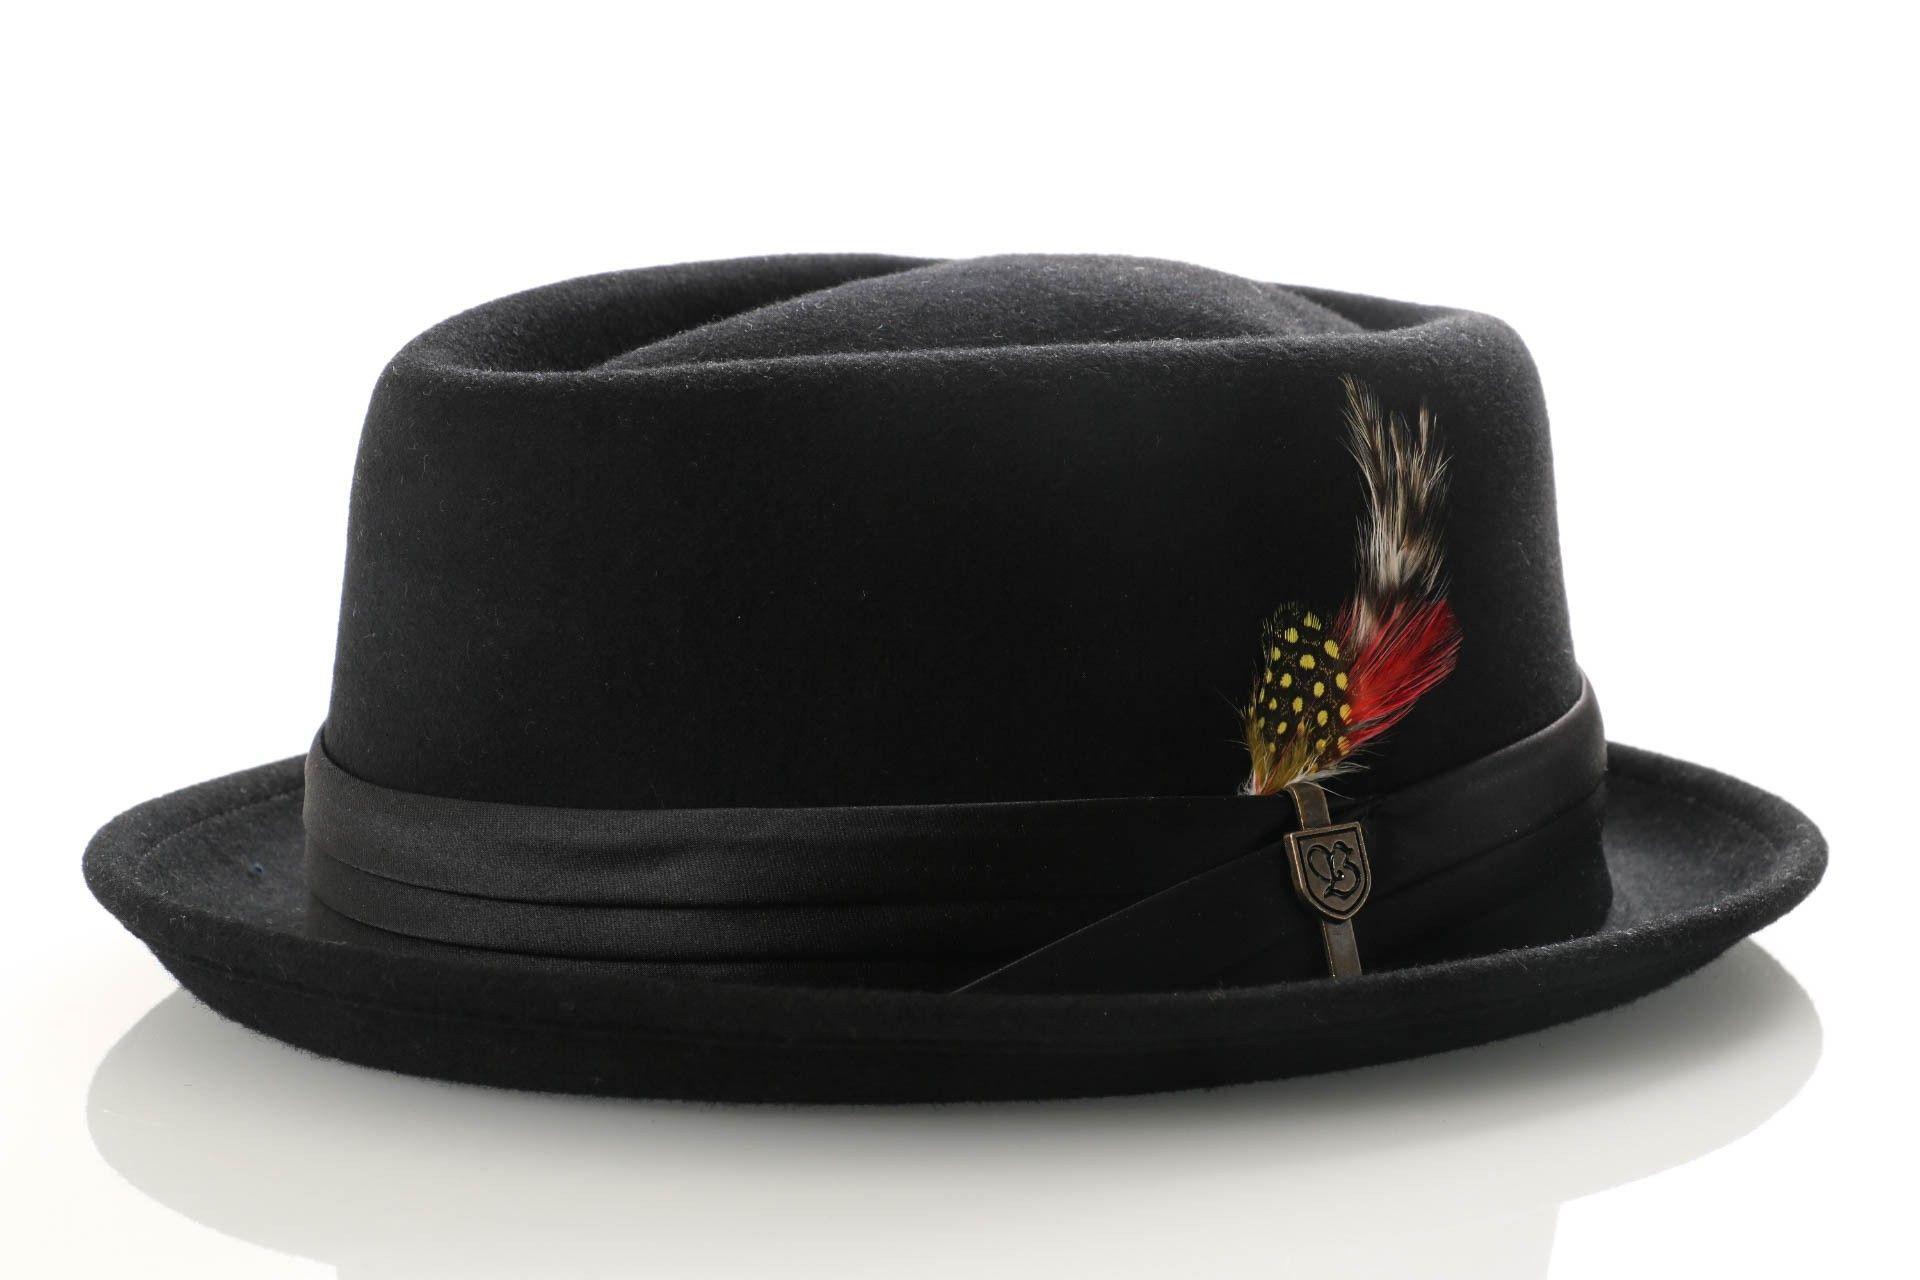 Afbeelding van Brixton 00036-0135 Hat Stout Pork Pie Black/Black